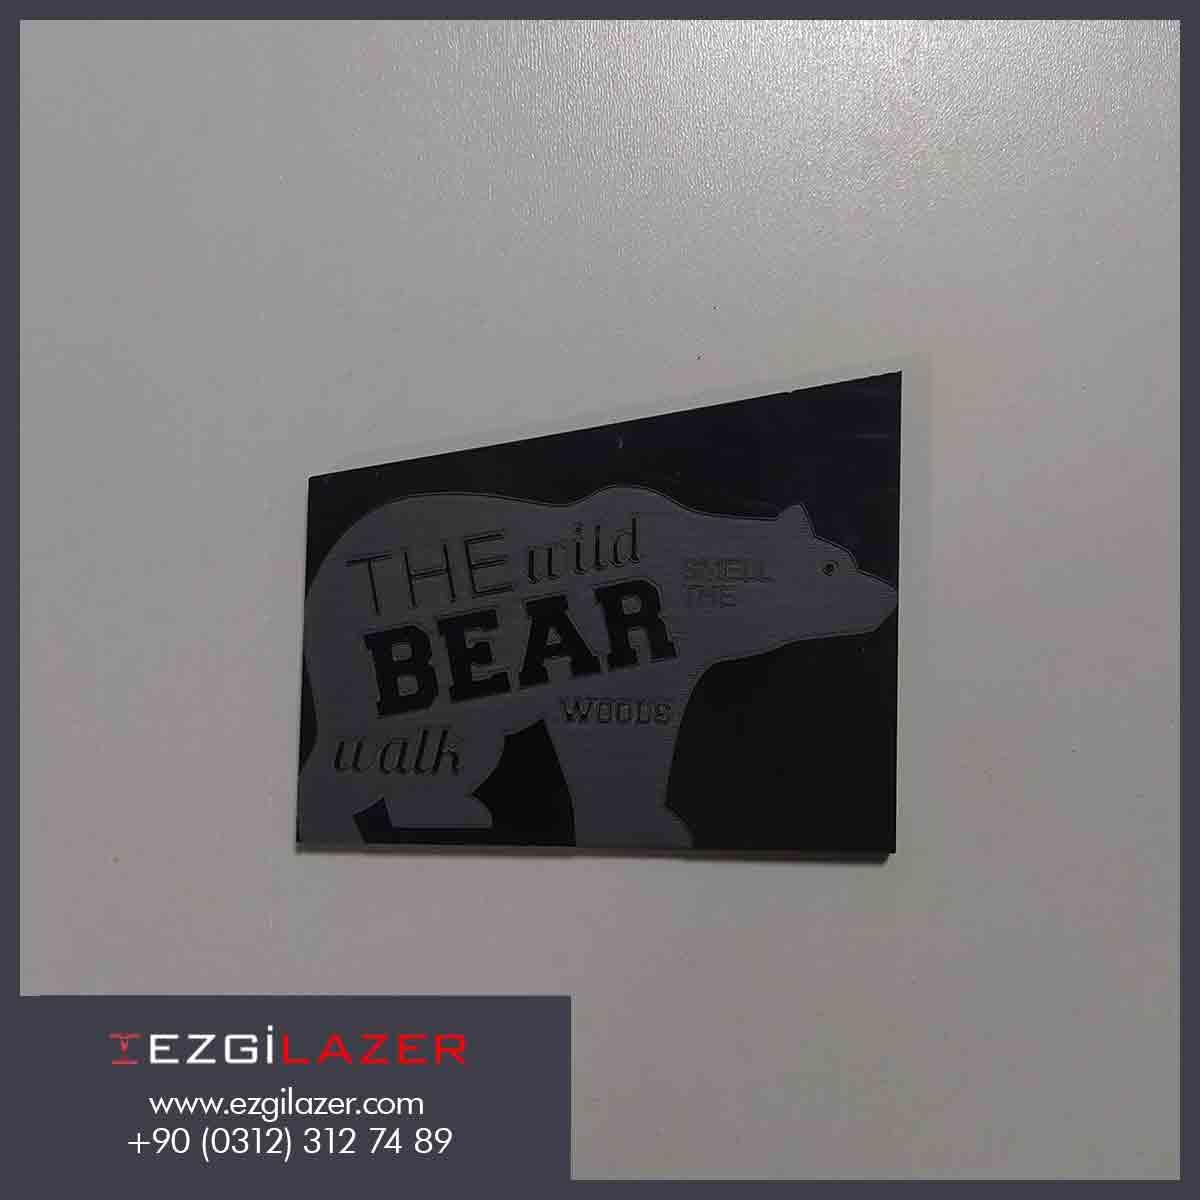 Galvo lazer markalama kutup ayısı